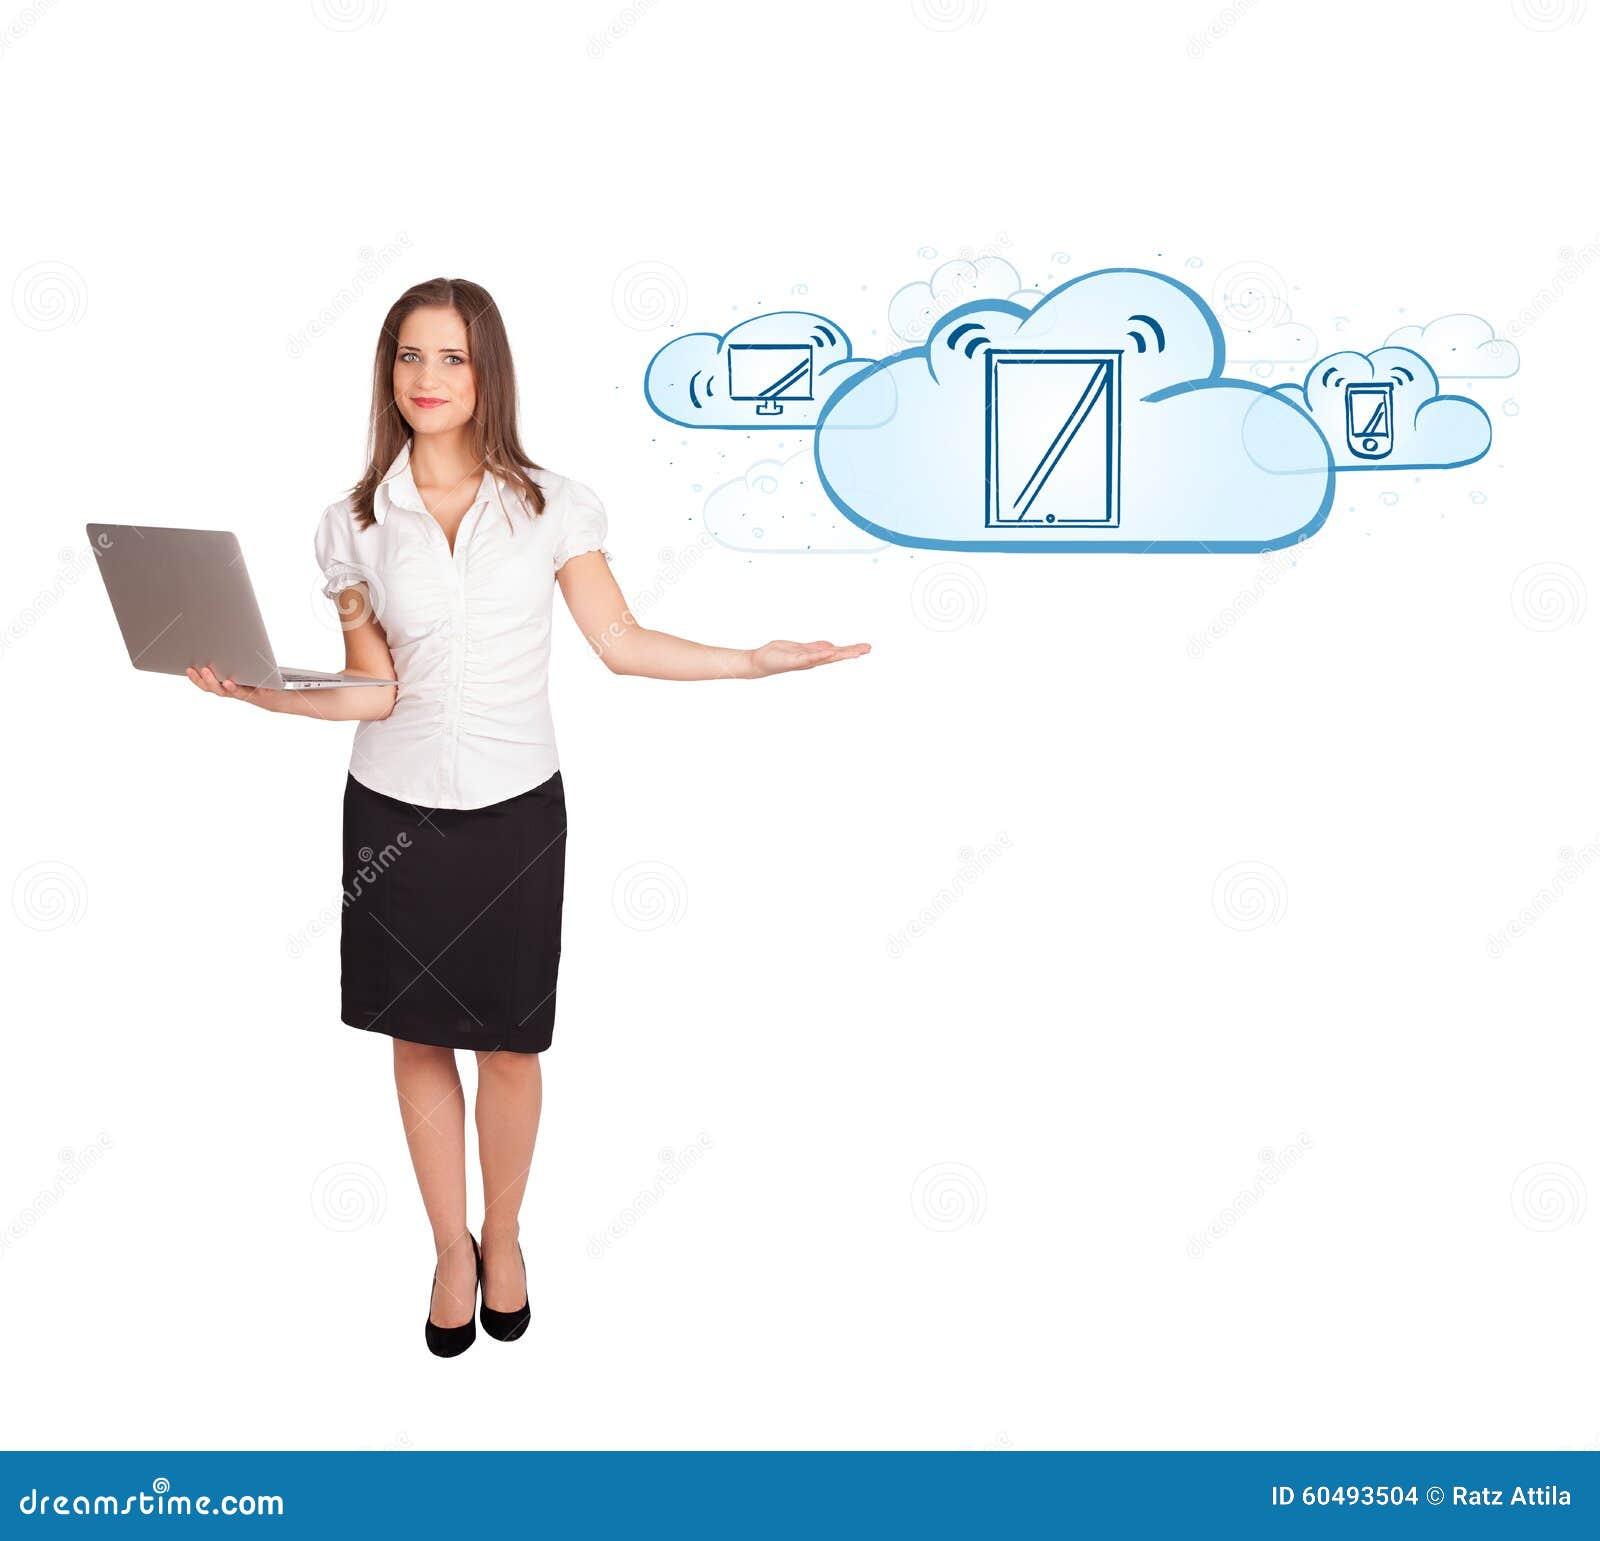 Jonge vrouw die moderne apparaten in wolken voorstelt stock foto afbeelding 60493504 - Moderne apparaten ...